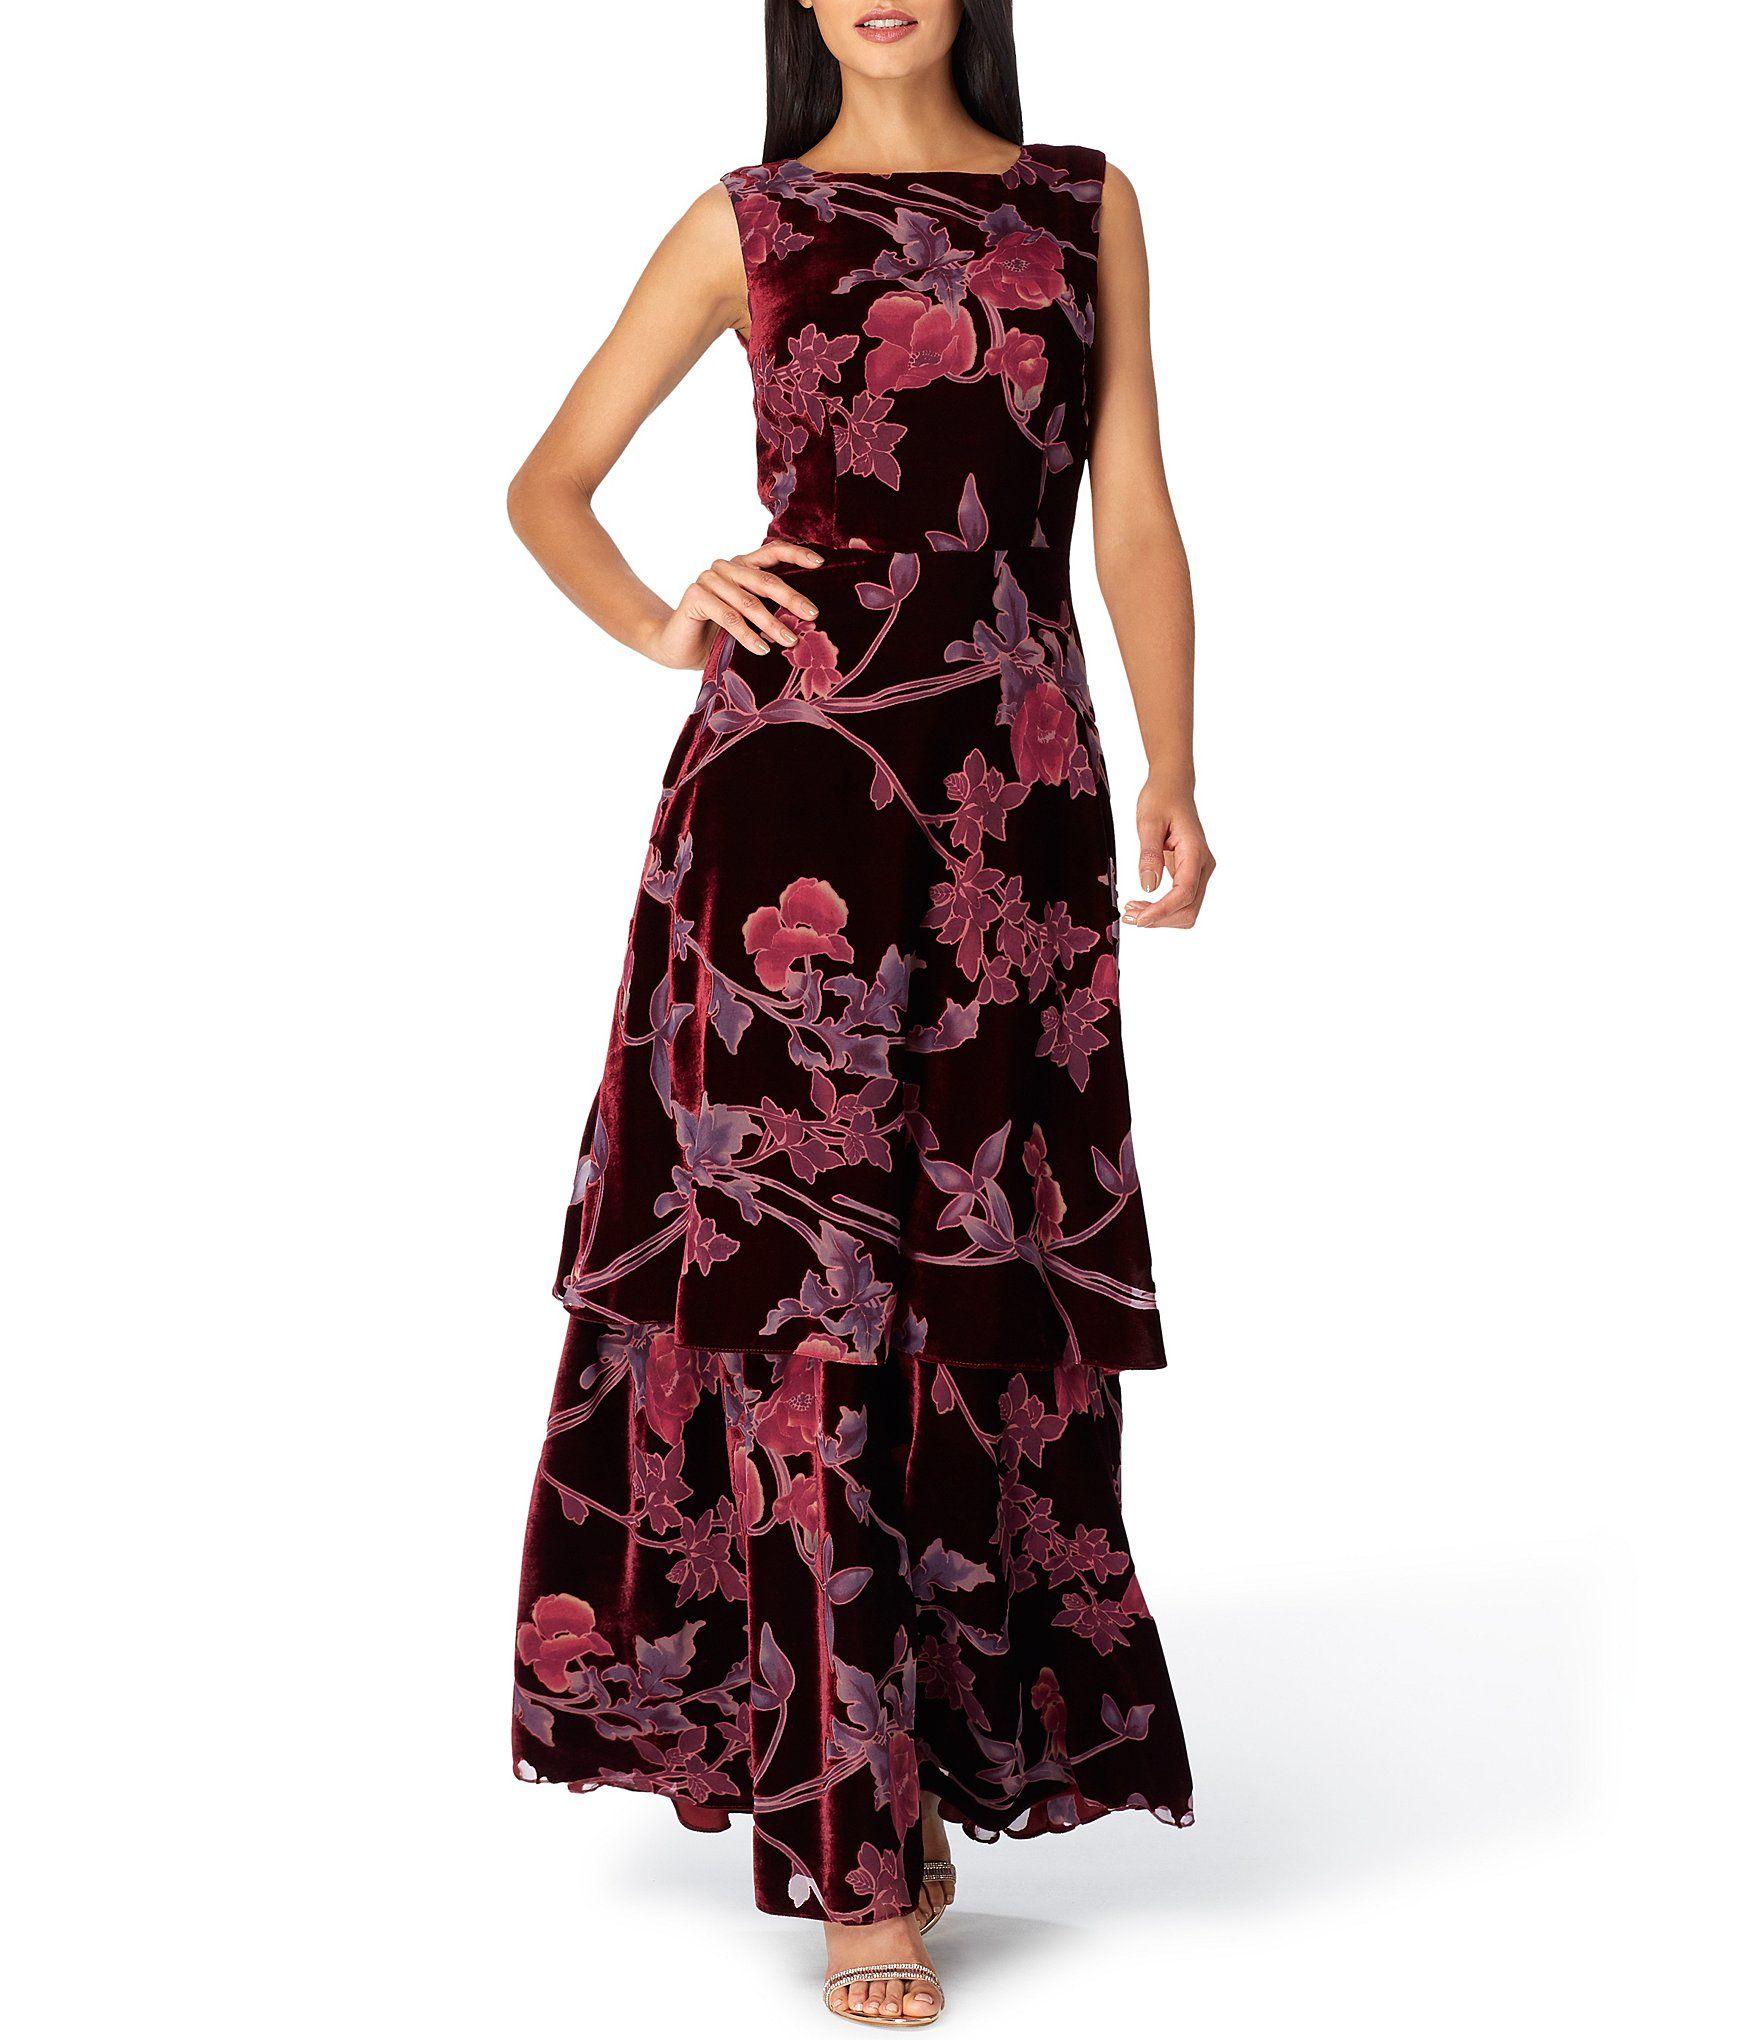 784d8f6488 Tahari ASL Velvet Burnout Floral Print Tiered Skirt Sleeveless A-Line Gown